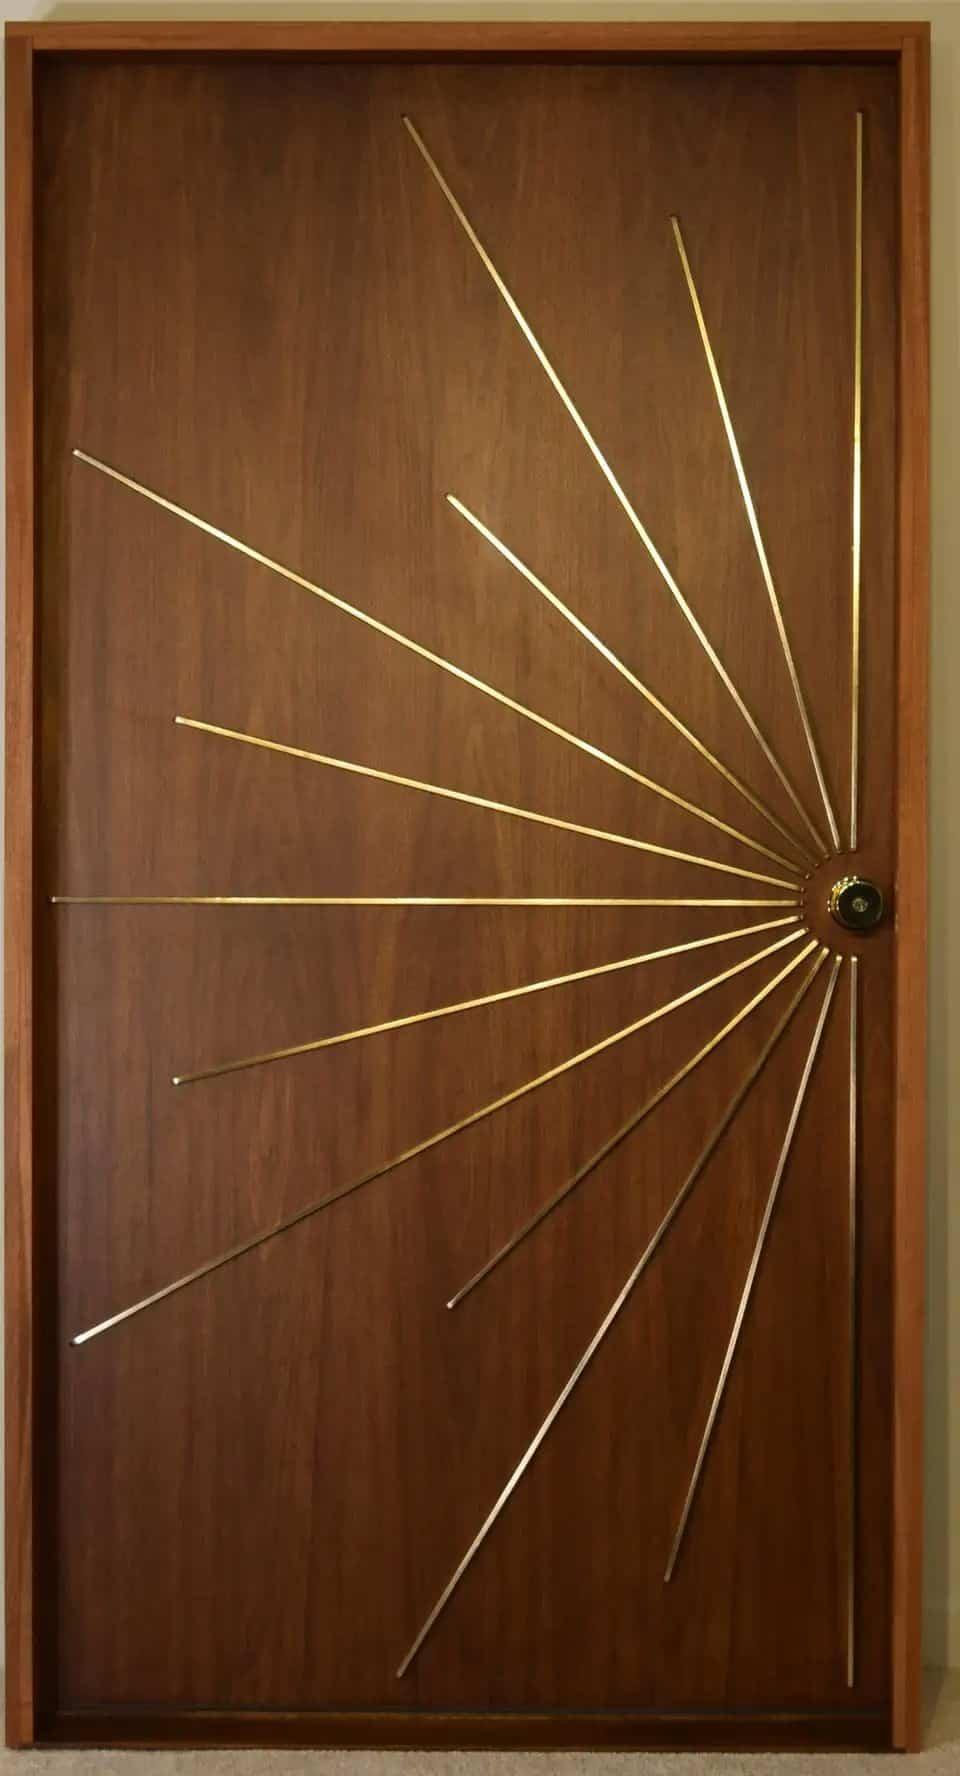 hinged wood door with golden accents